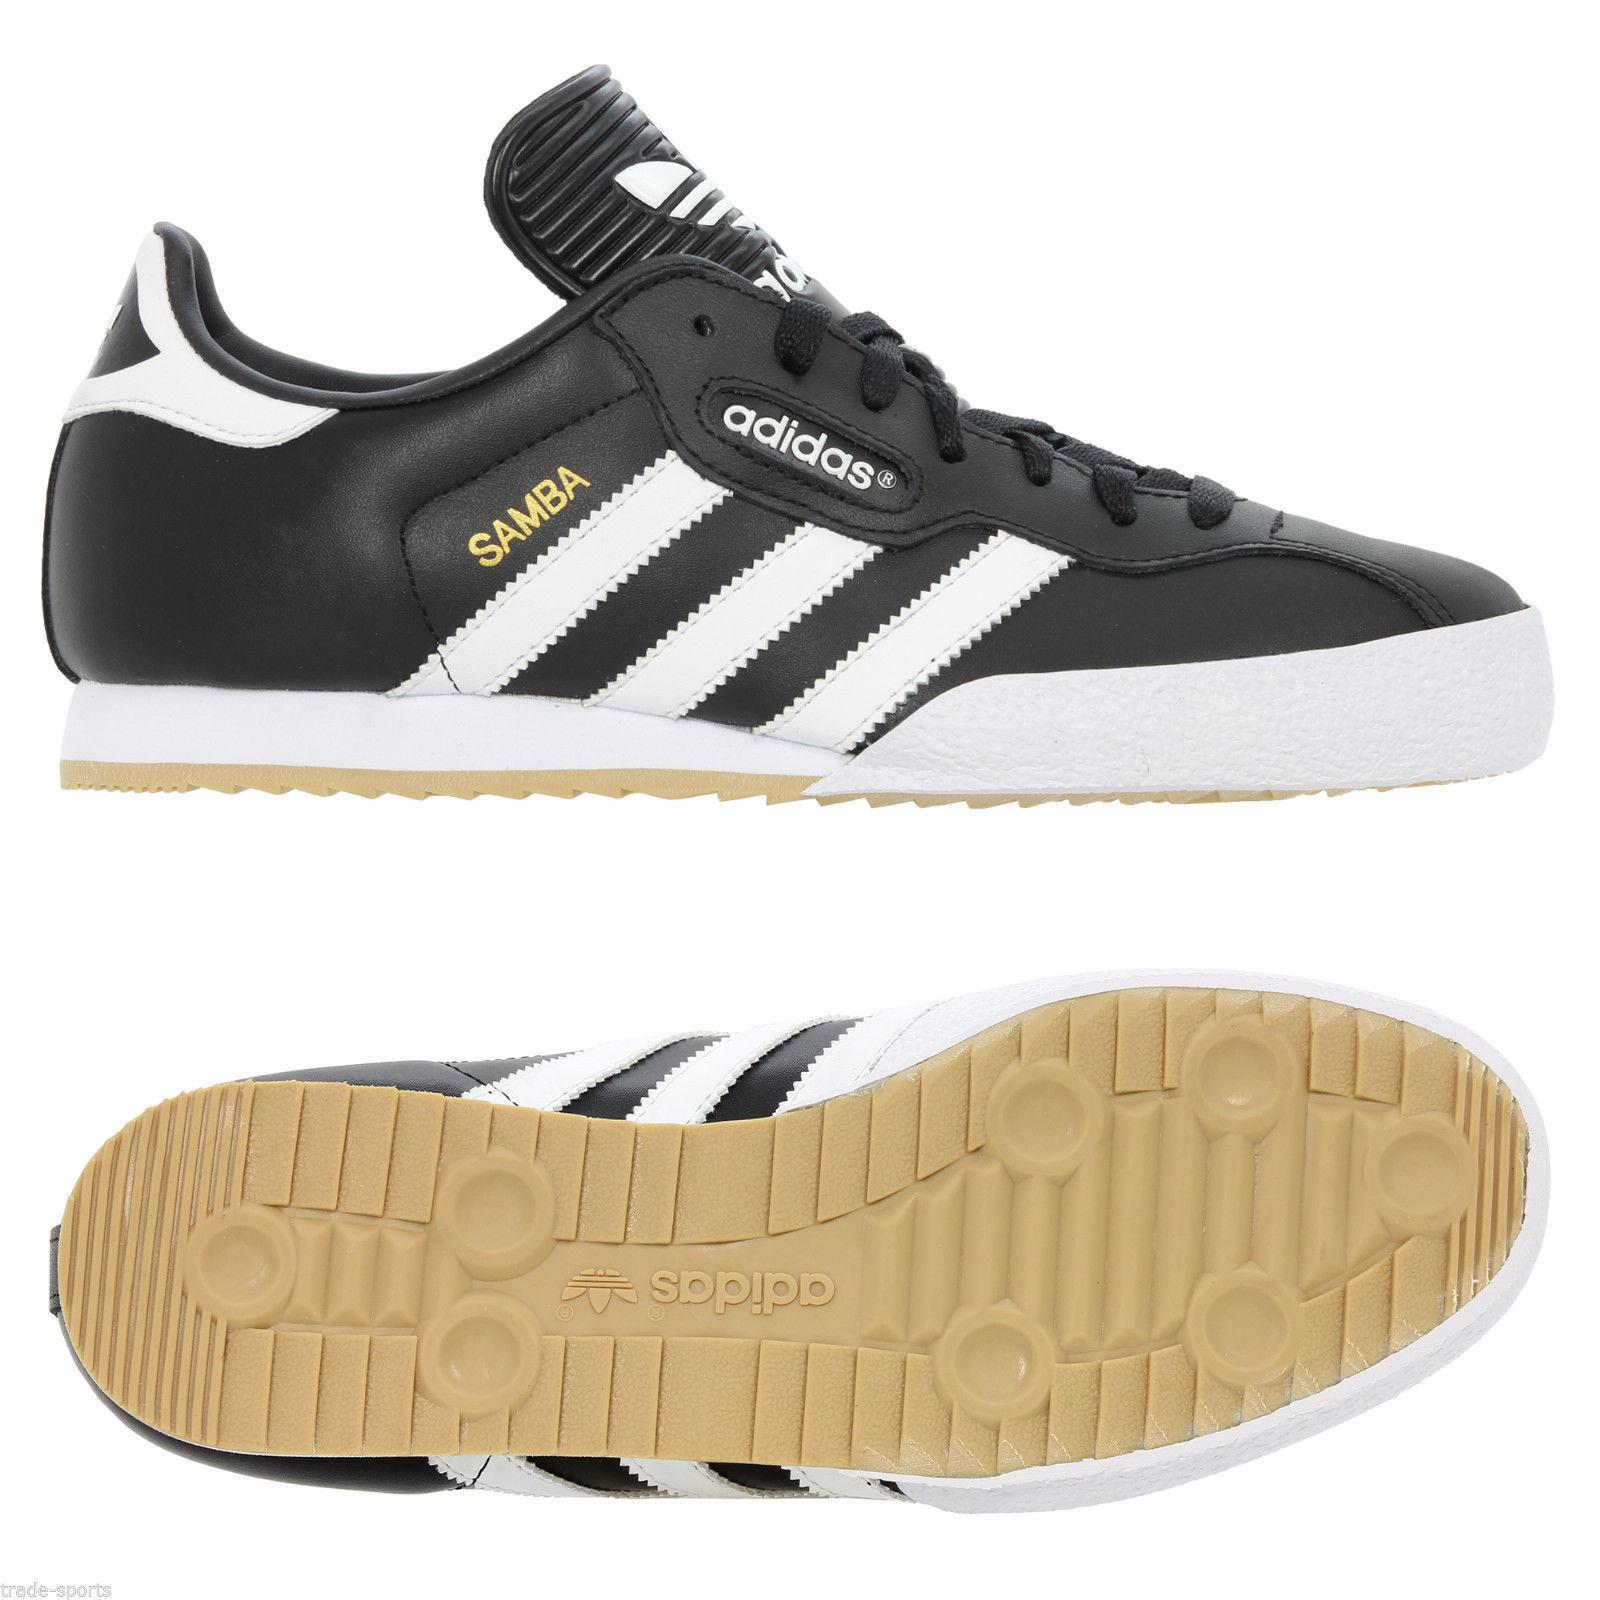 Adidas Original Mens Shoes Samba Super Shoes Mens Trainers Black/White 447b48